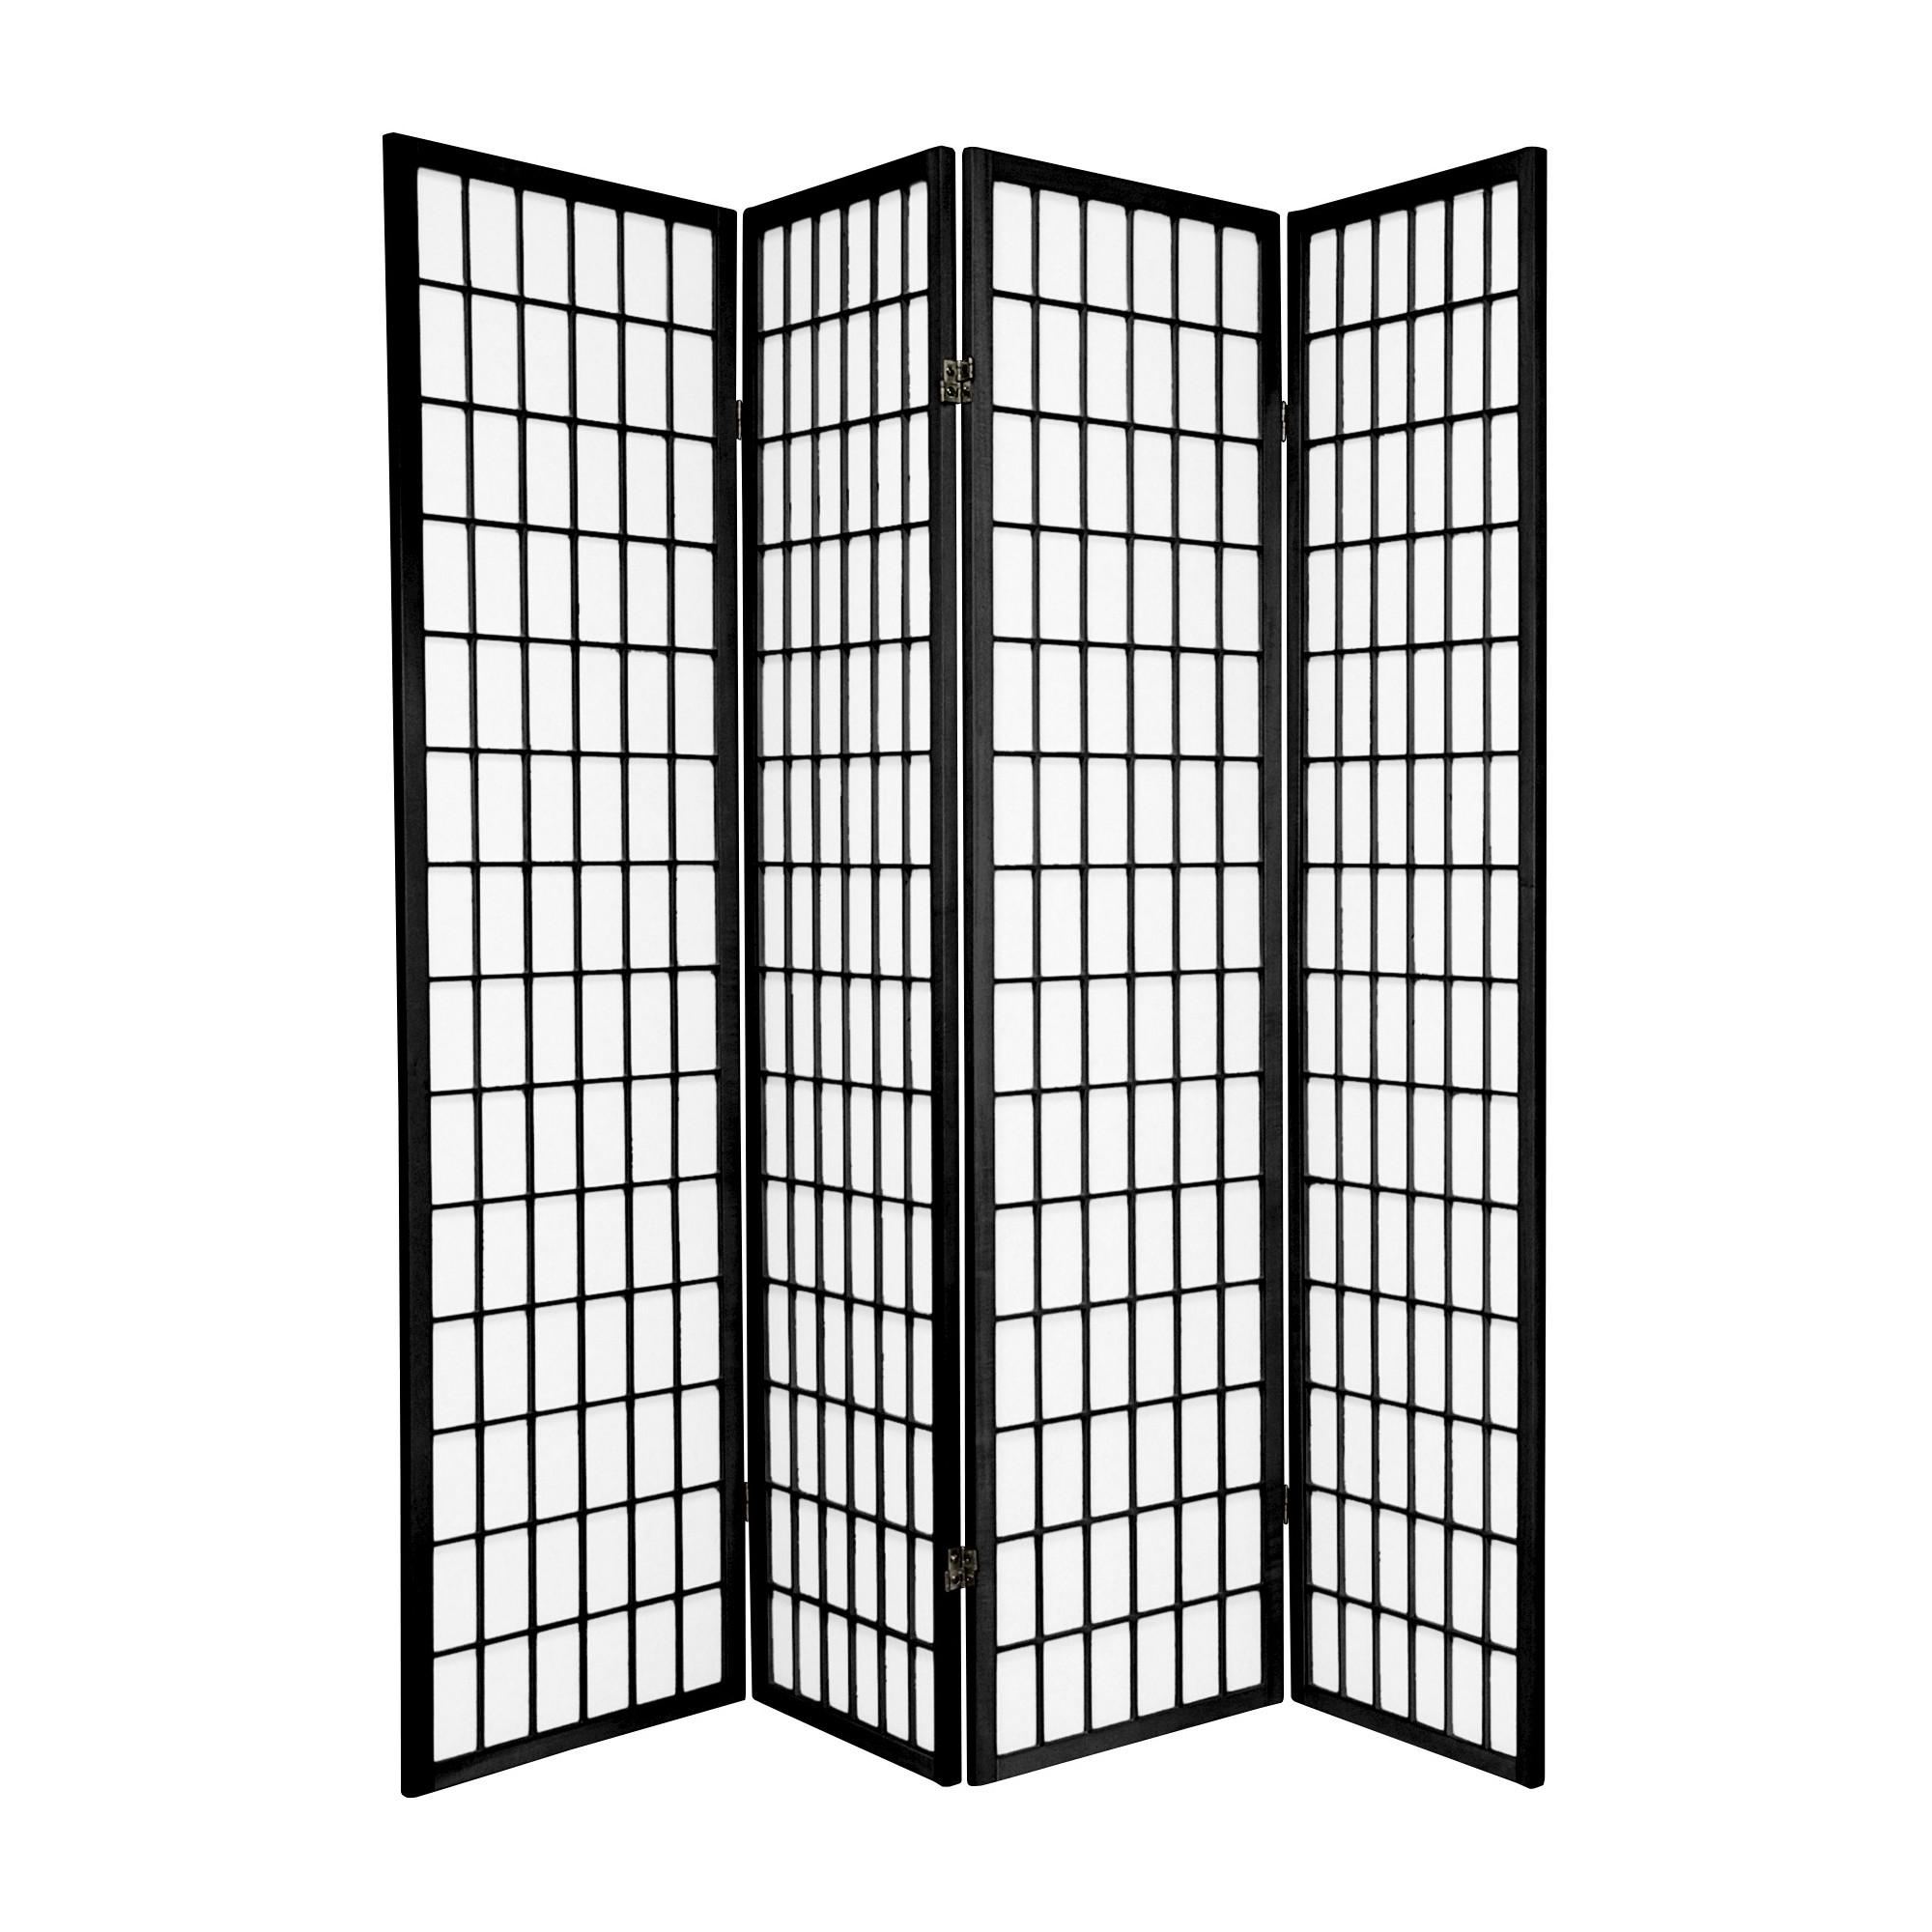 6 Ft Tall Window Pane Shoji Screen Black 4 Panels Shoji Screen Home Furnishings Tall Windows